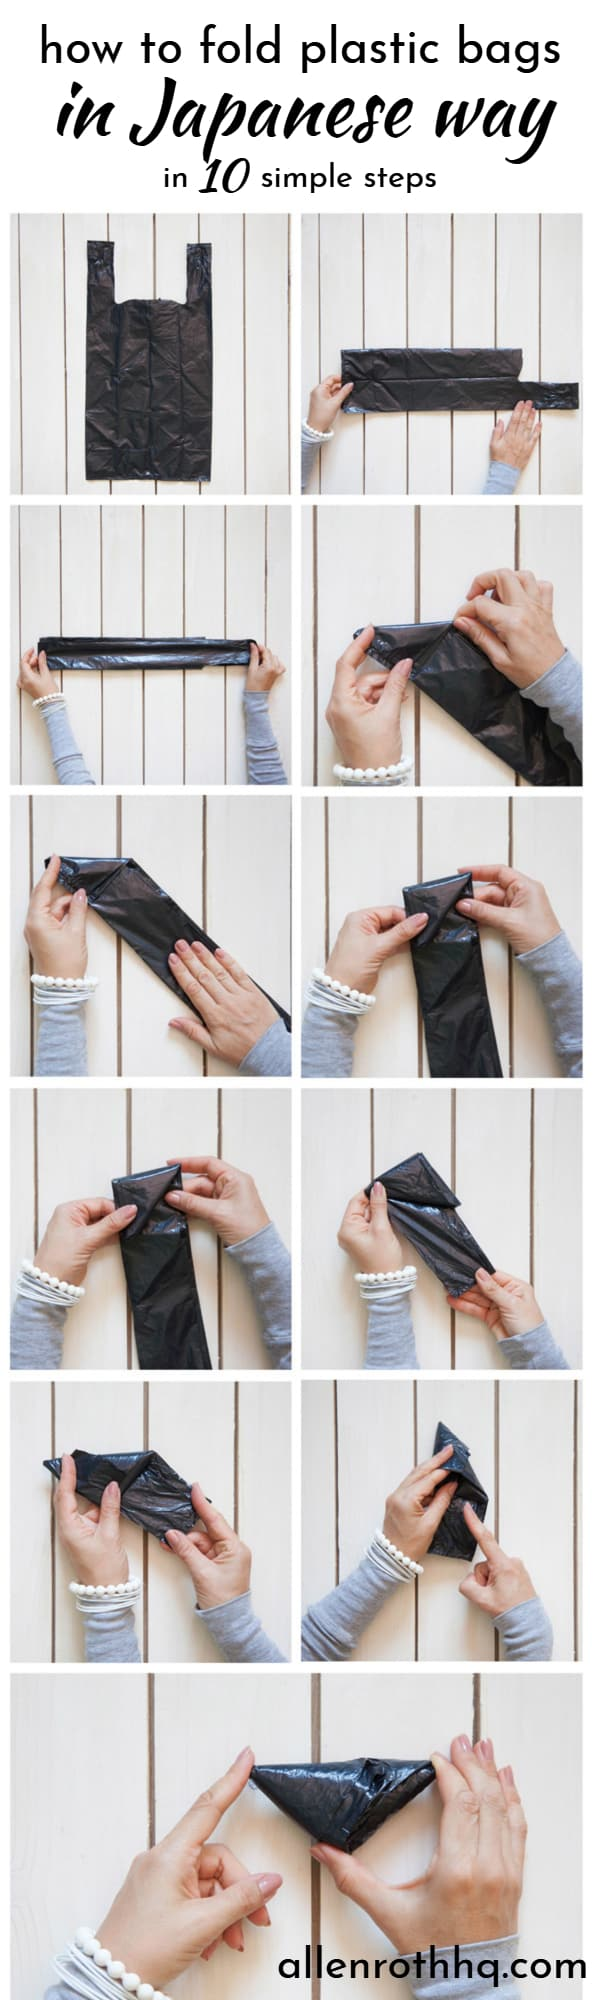 fold bags japanese way